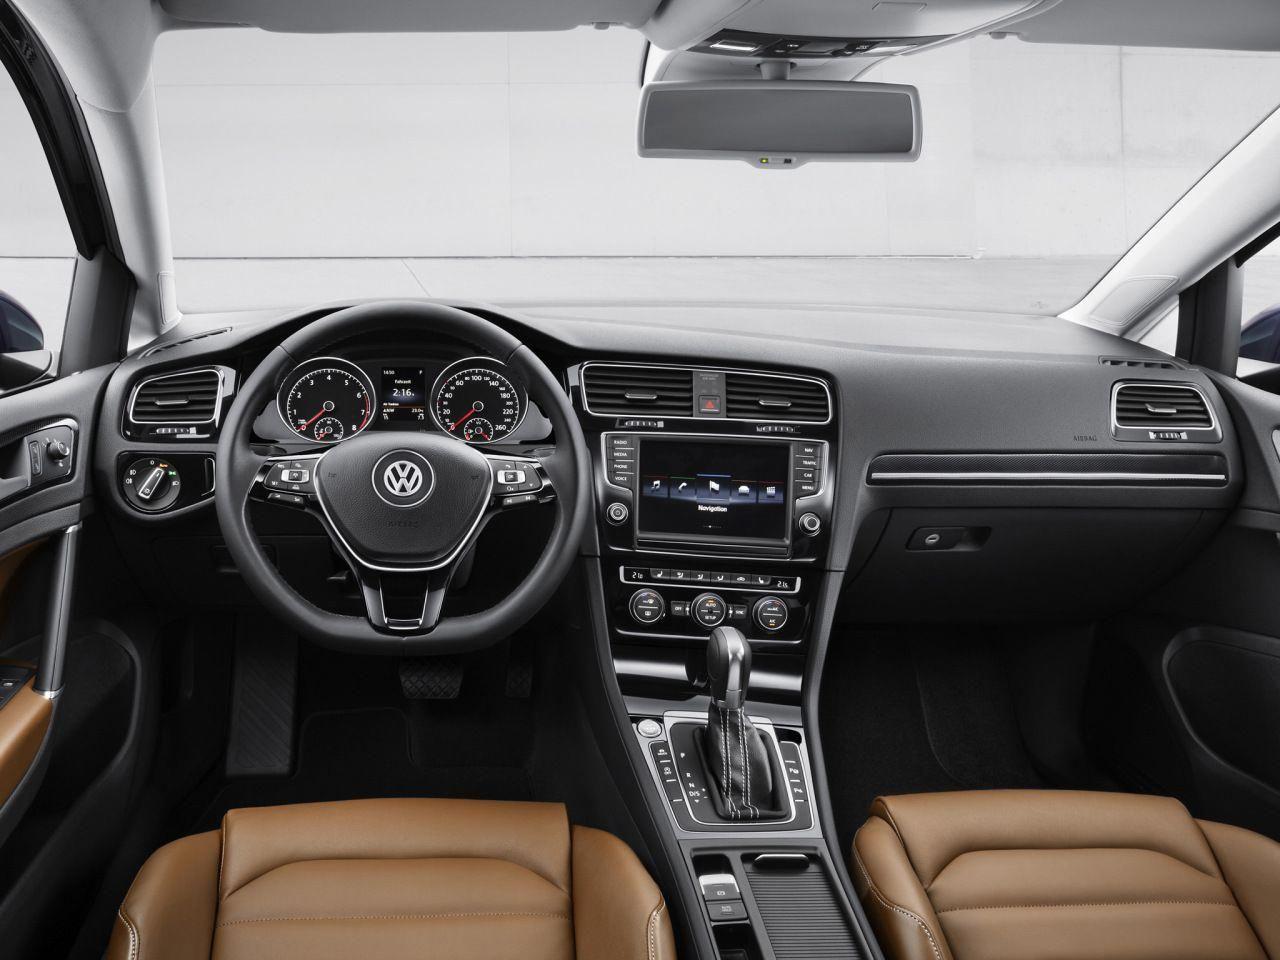 Vw Golf 2015 Interior Volkswagengolfvariant Volkswagen Golf Volkswagen Volkswagen Up